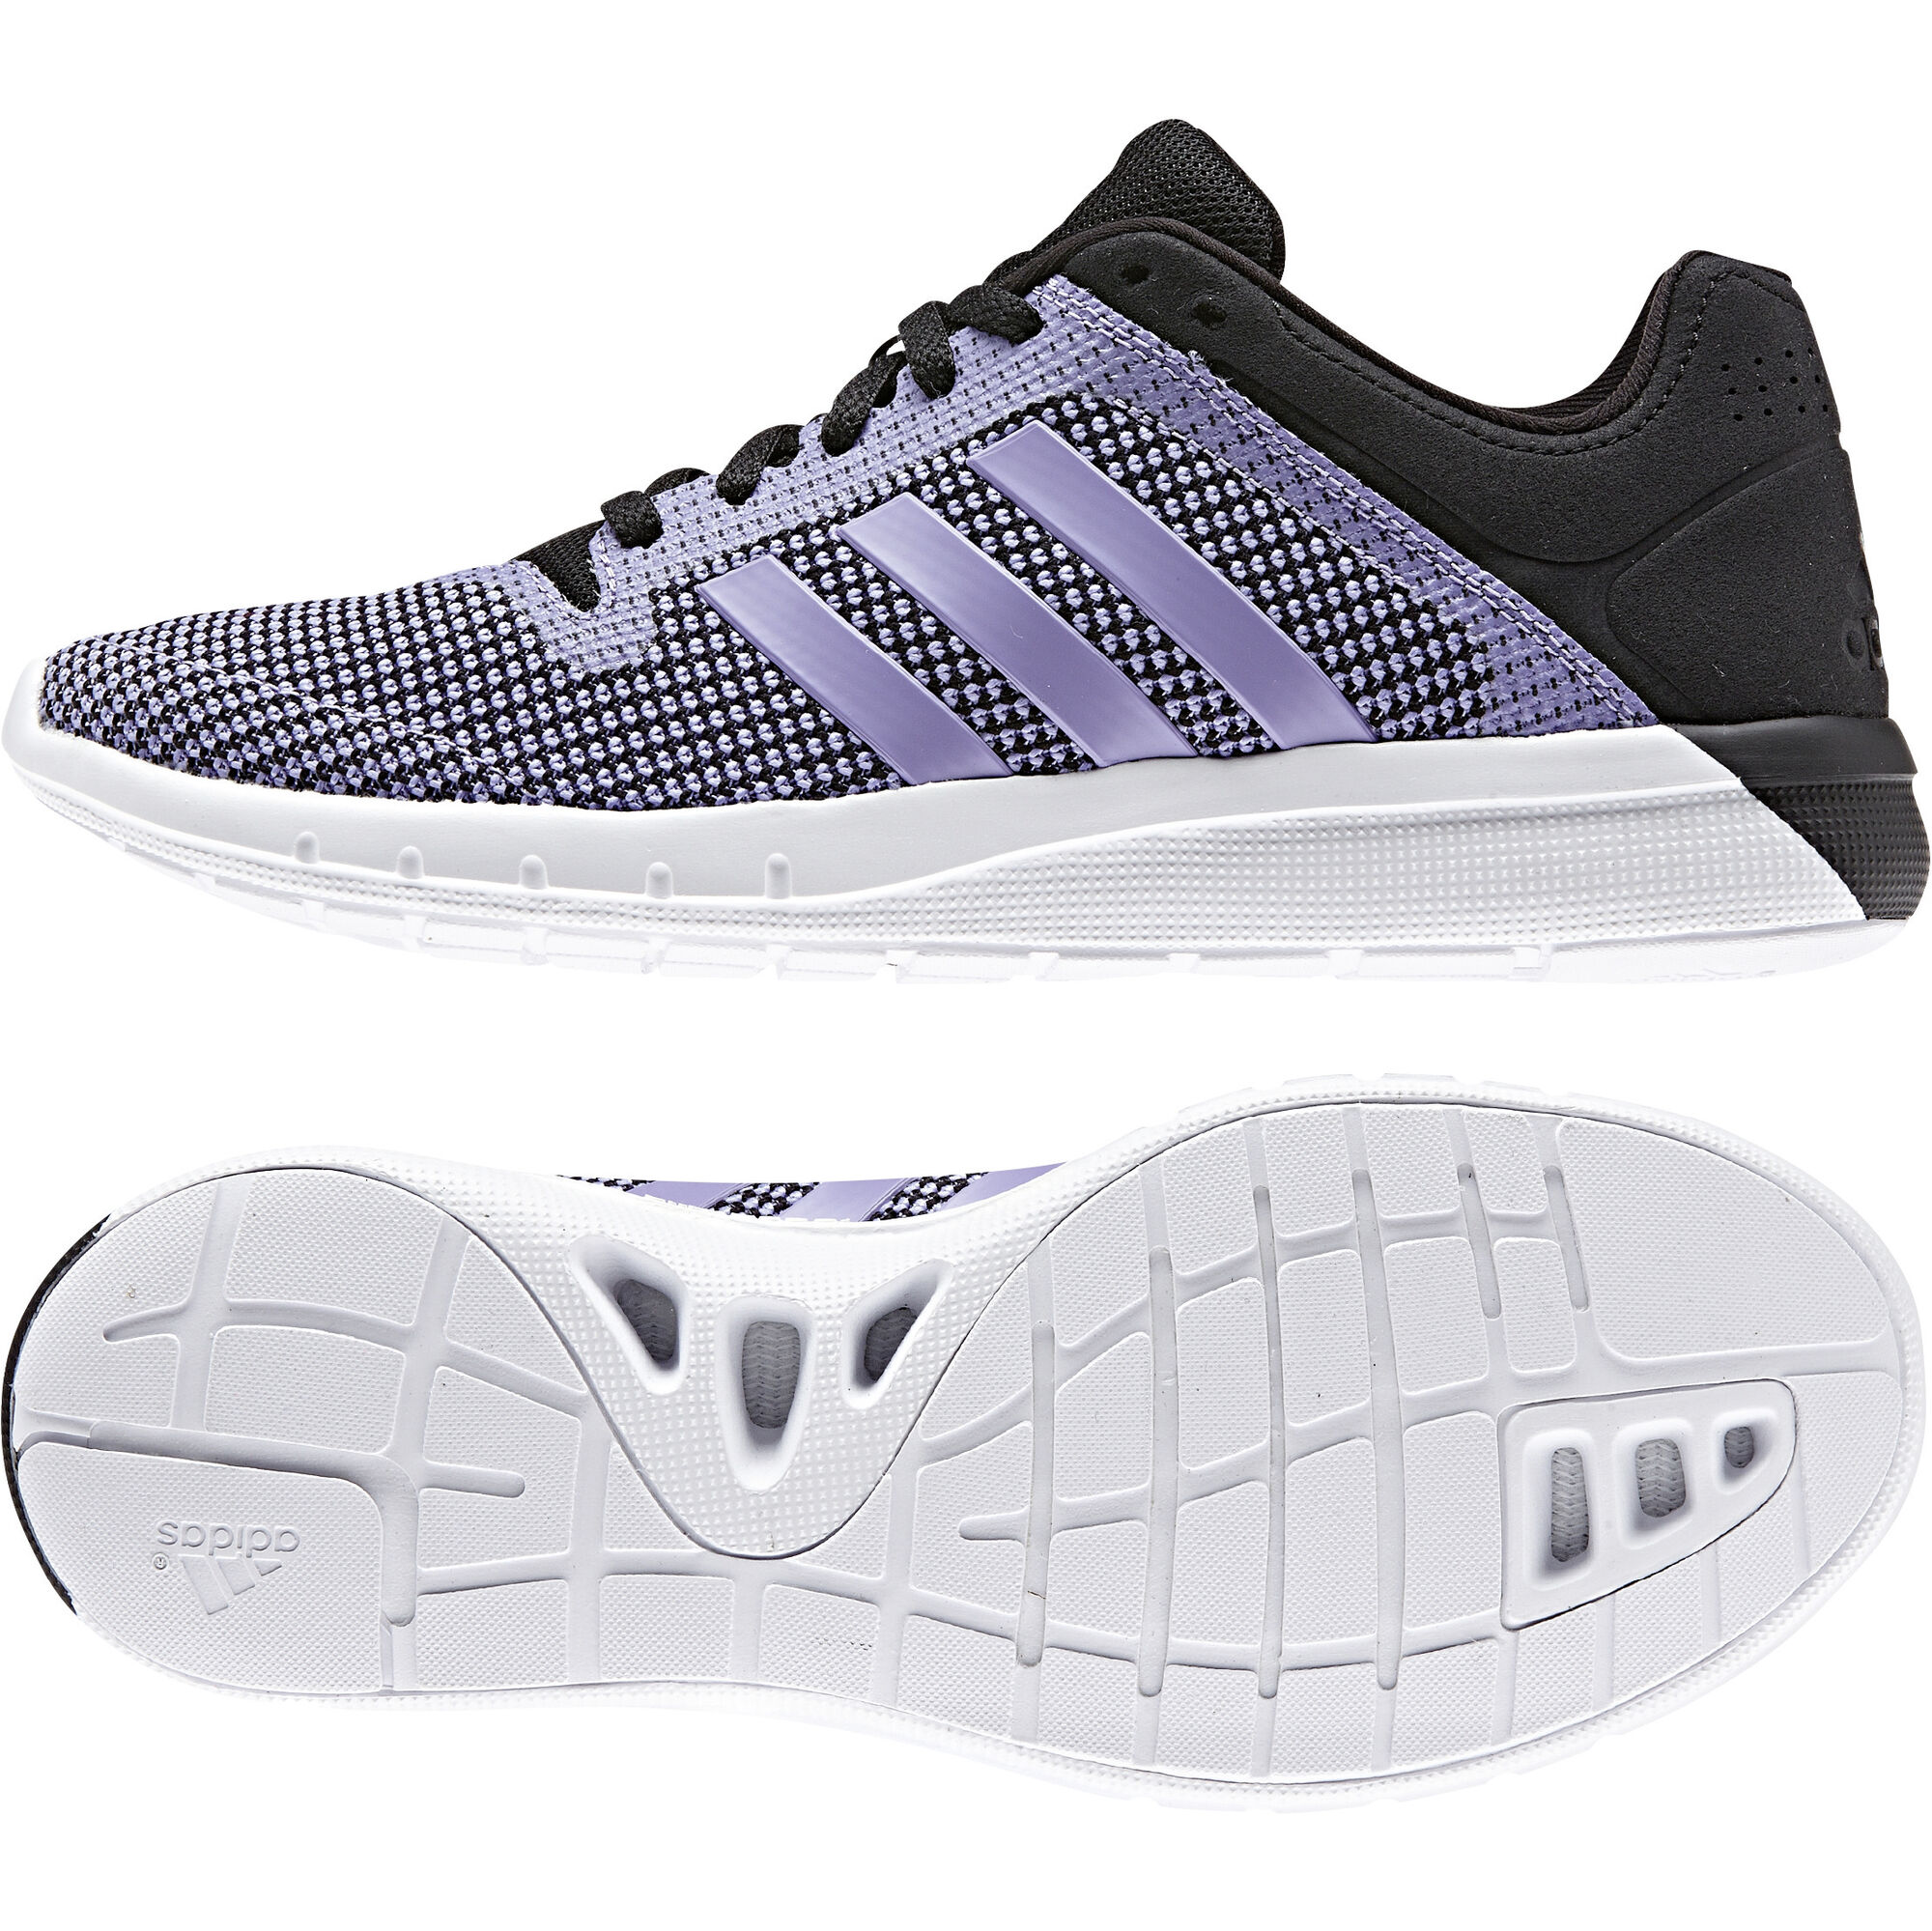 info for f7db0 8efa7 adidas adidas adidas adidas adidas. CC Fresh 2 ...